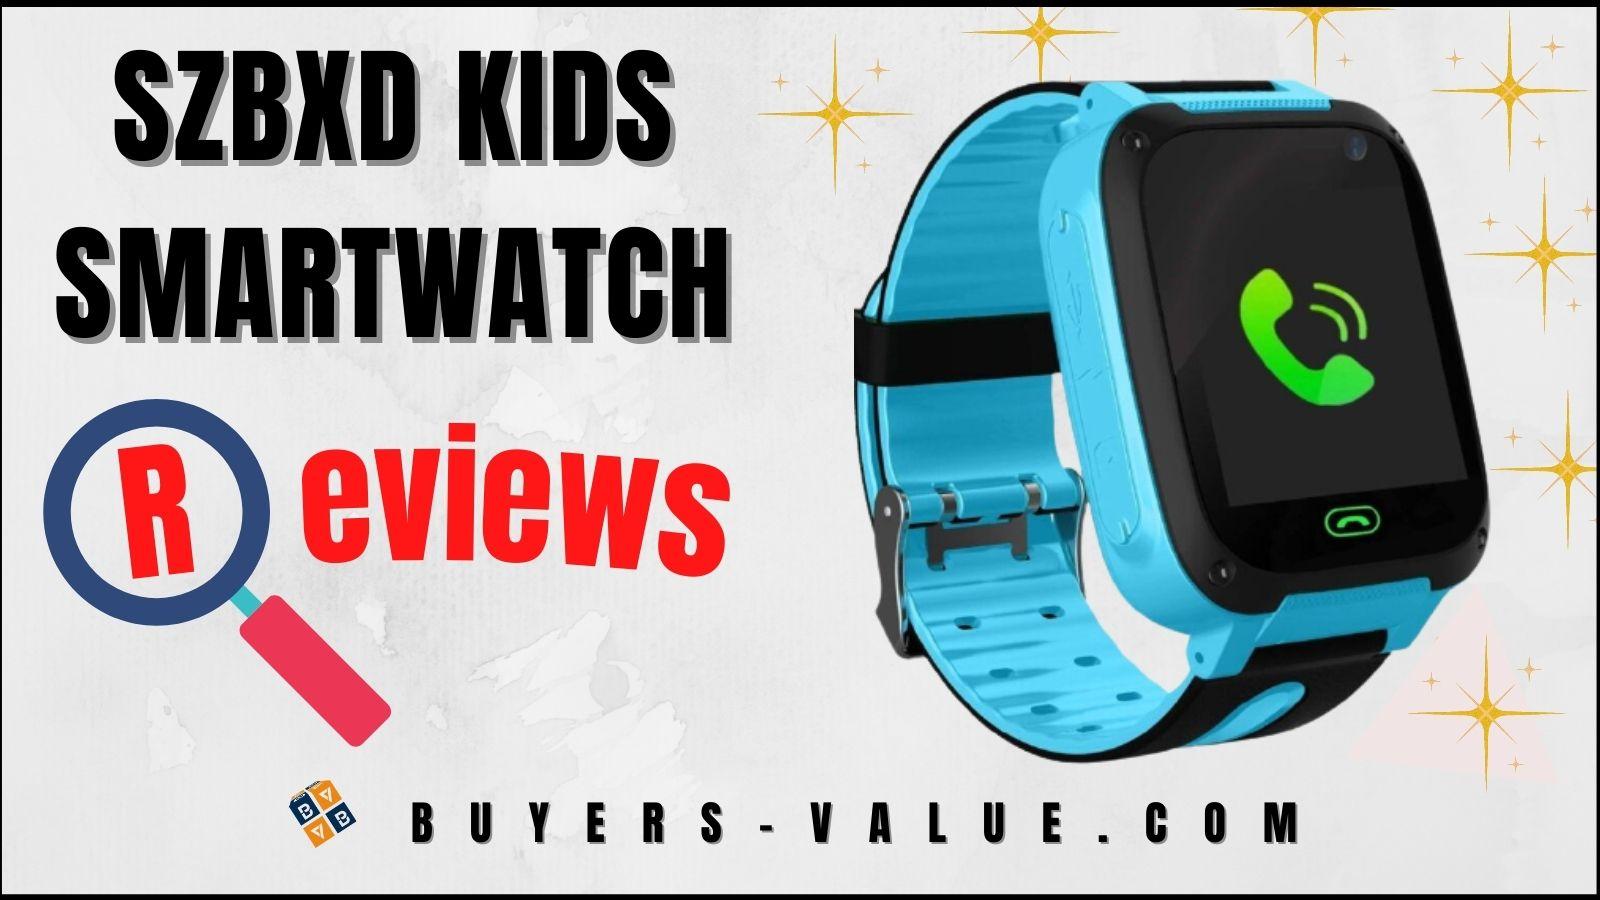 SZBXD Kids Smartwatch Detailed Review